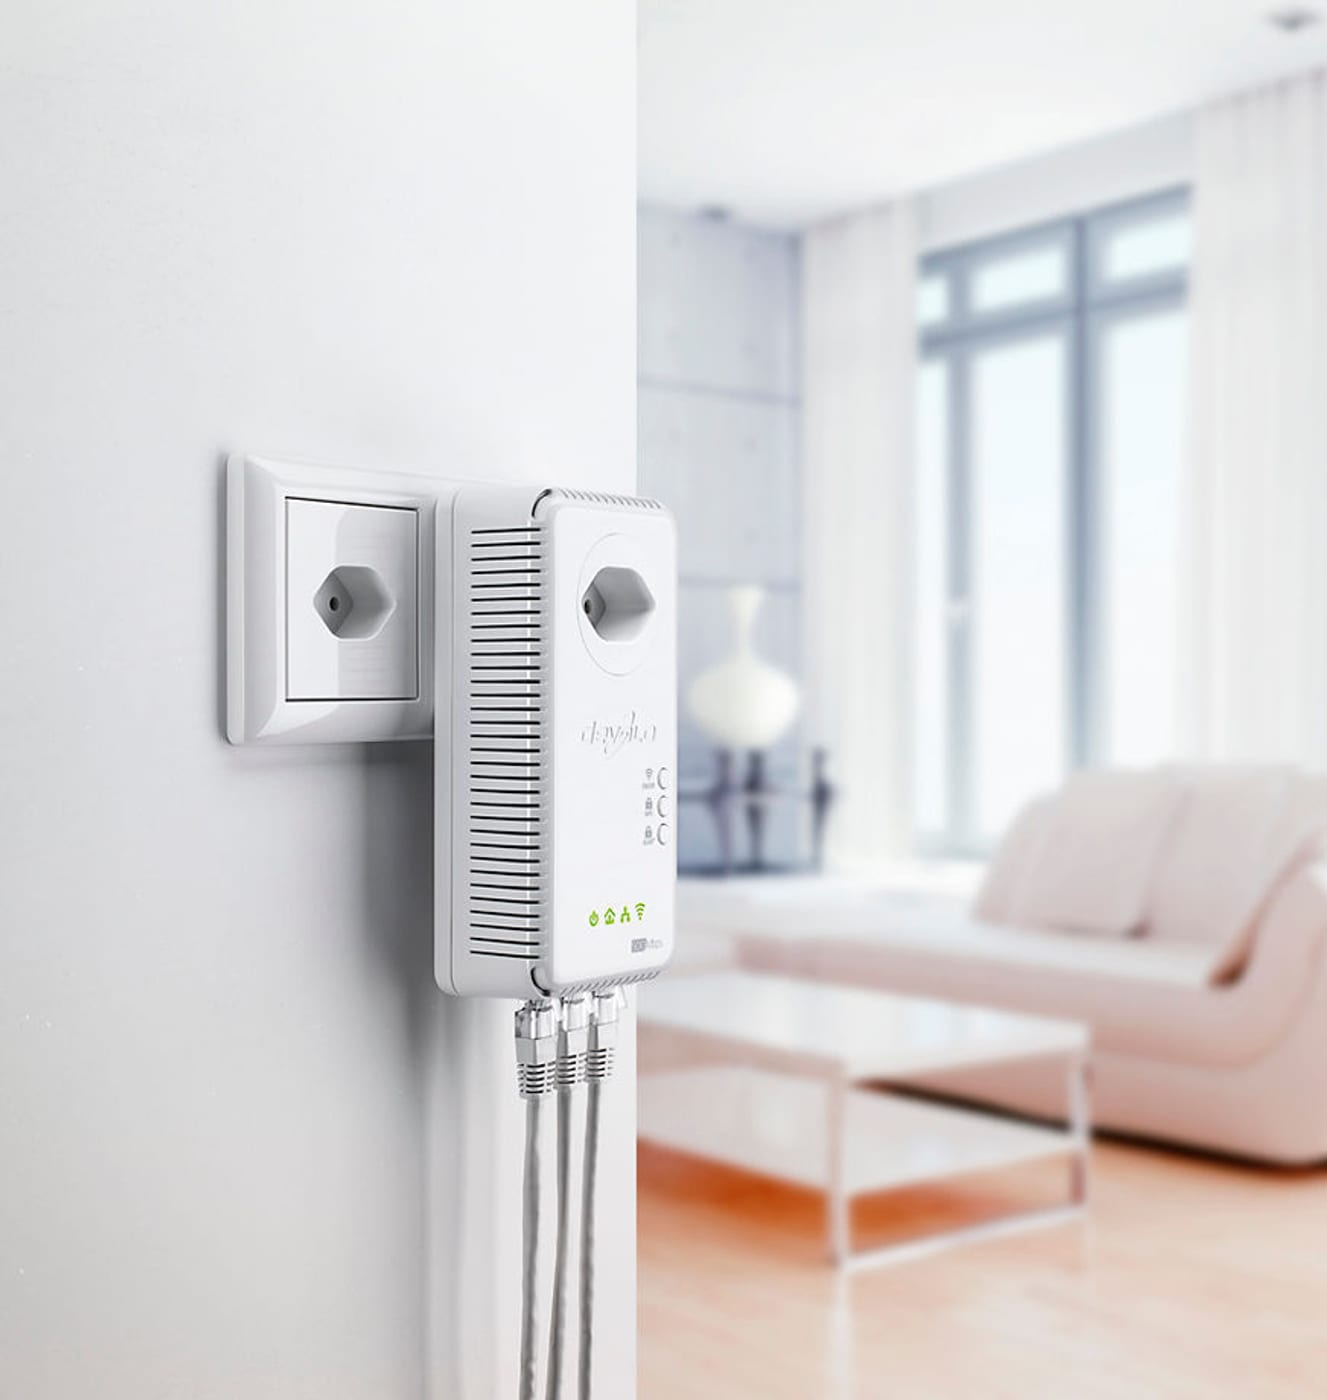 devolo dlan 500 av wireless powerline starter kit migros. Black Bedroom Furniture Sets. Home Design Ideas